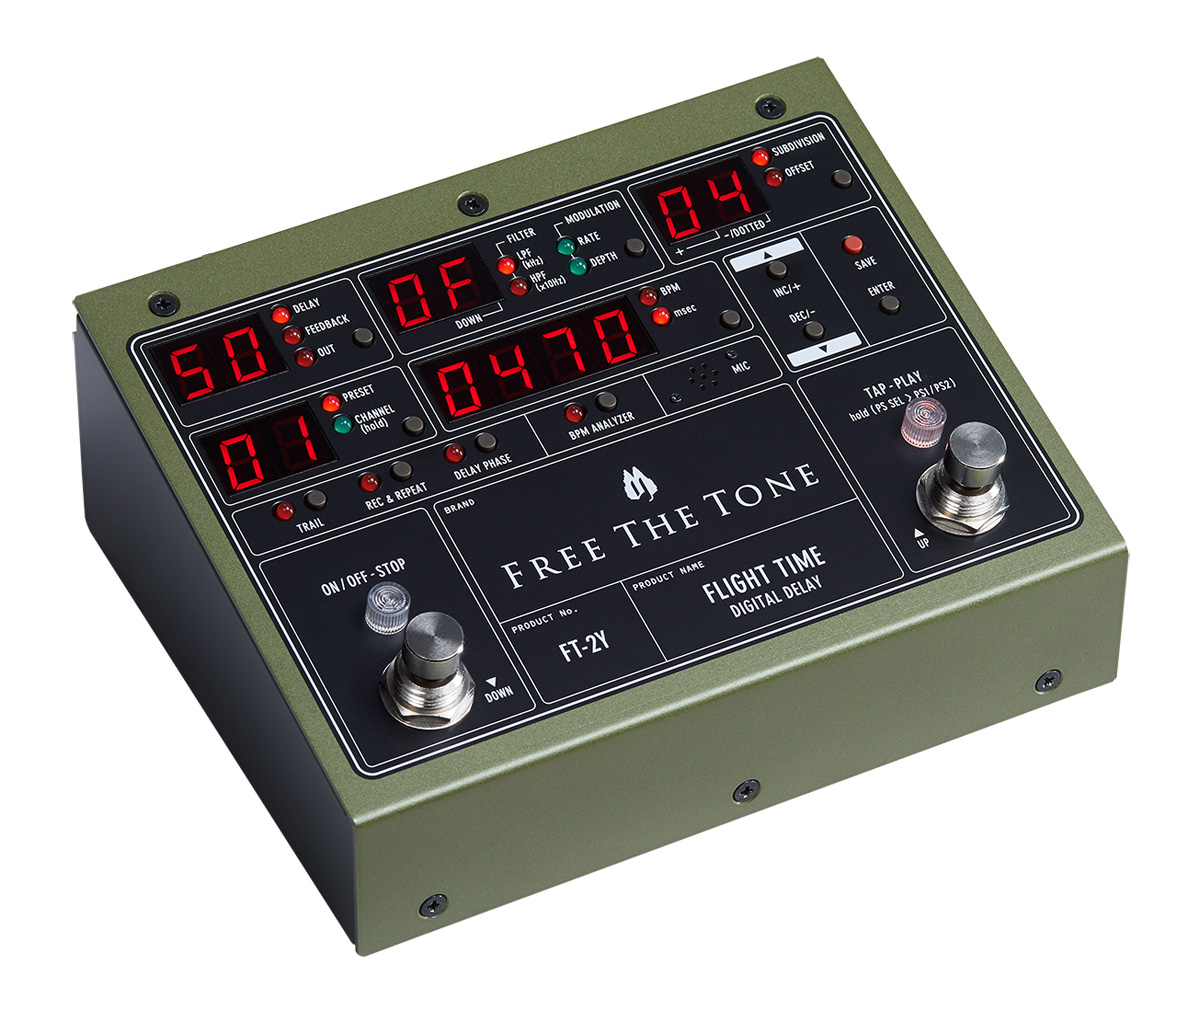 FREE THE TONE / FLIGHT TIME FT-2Y DIGITAL DELAY フリーザトーン デジタルディレイ